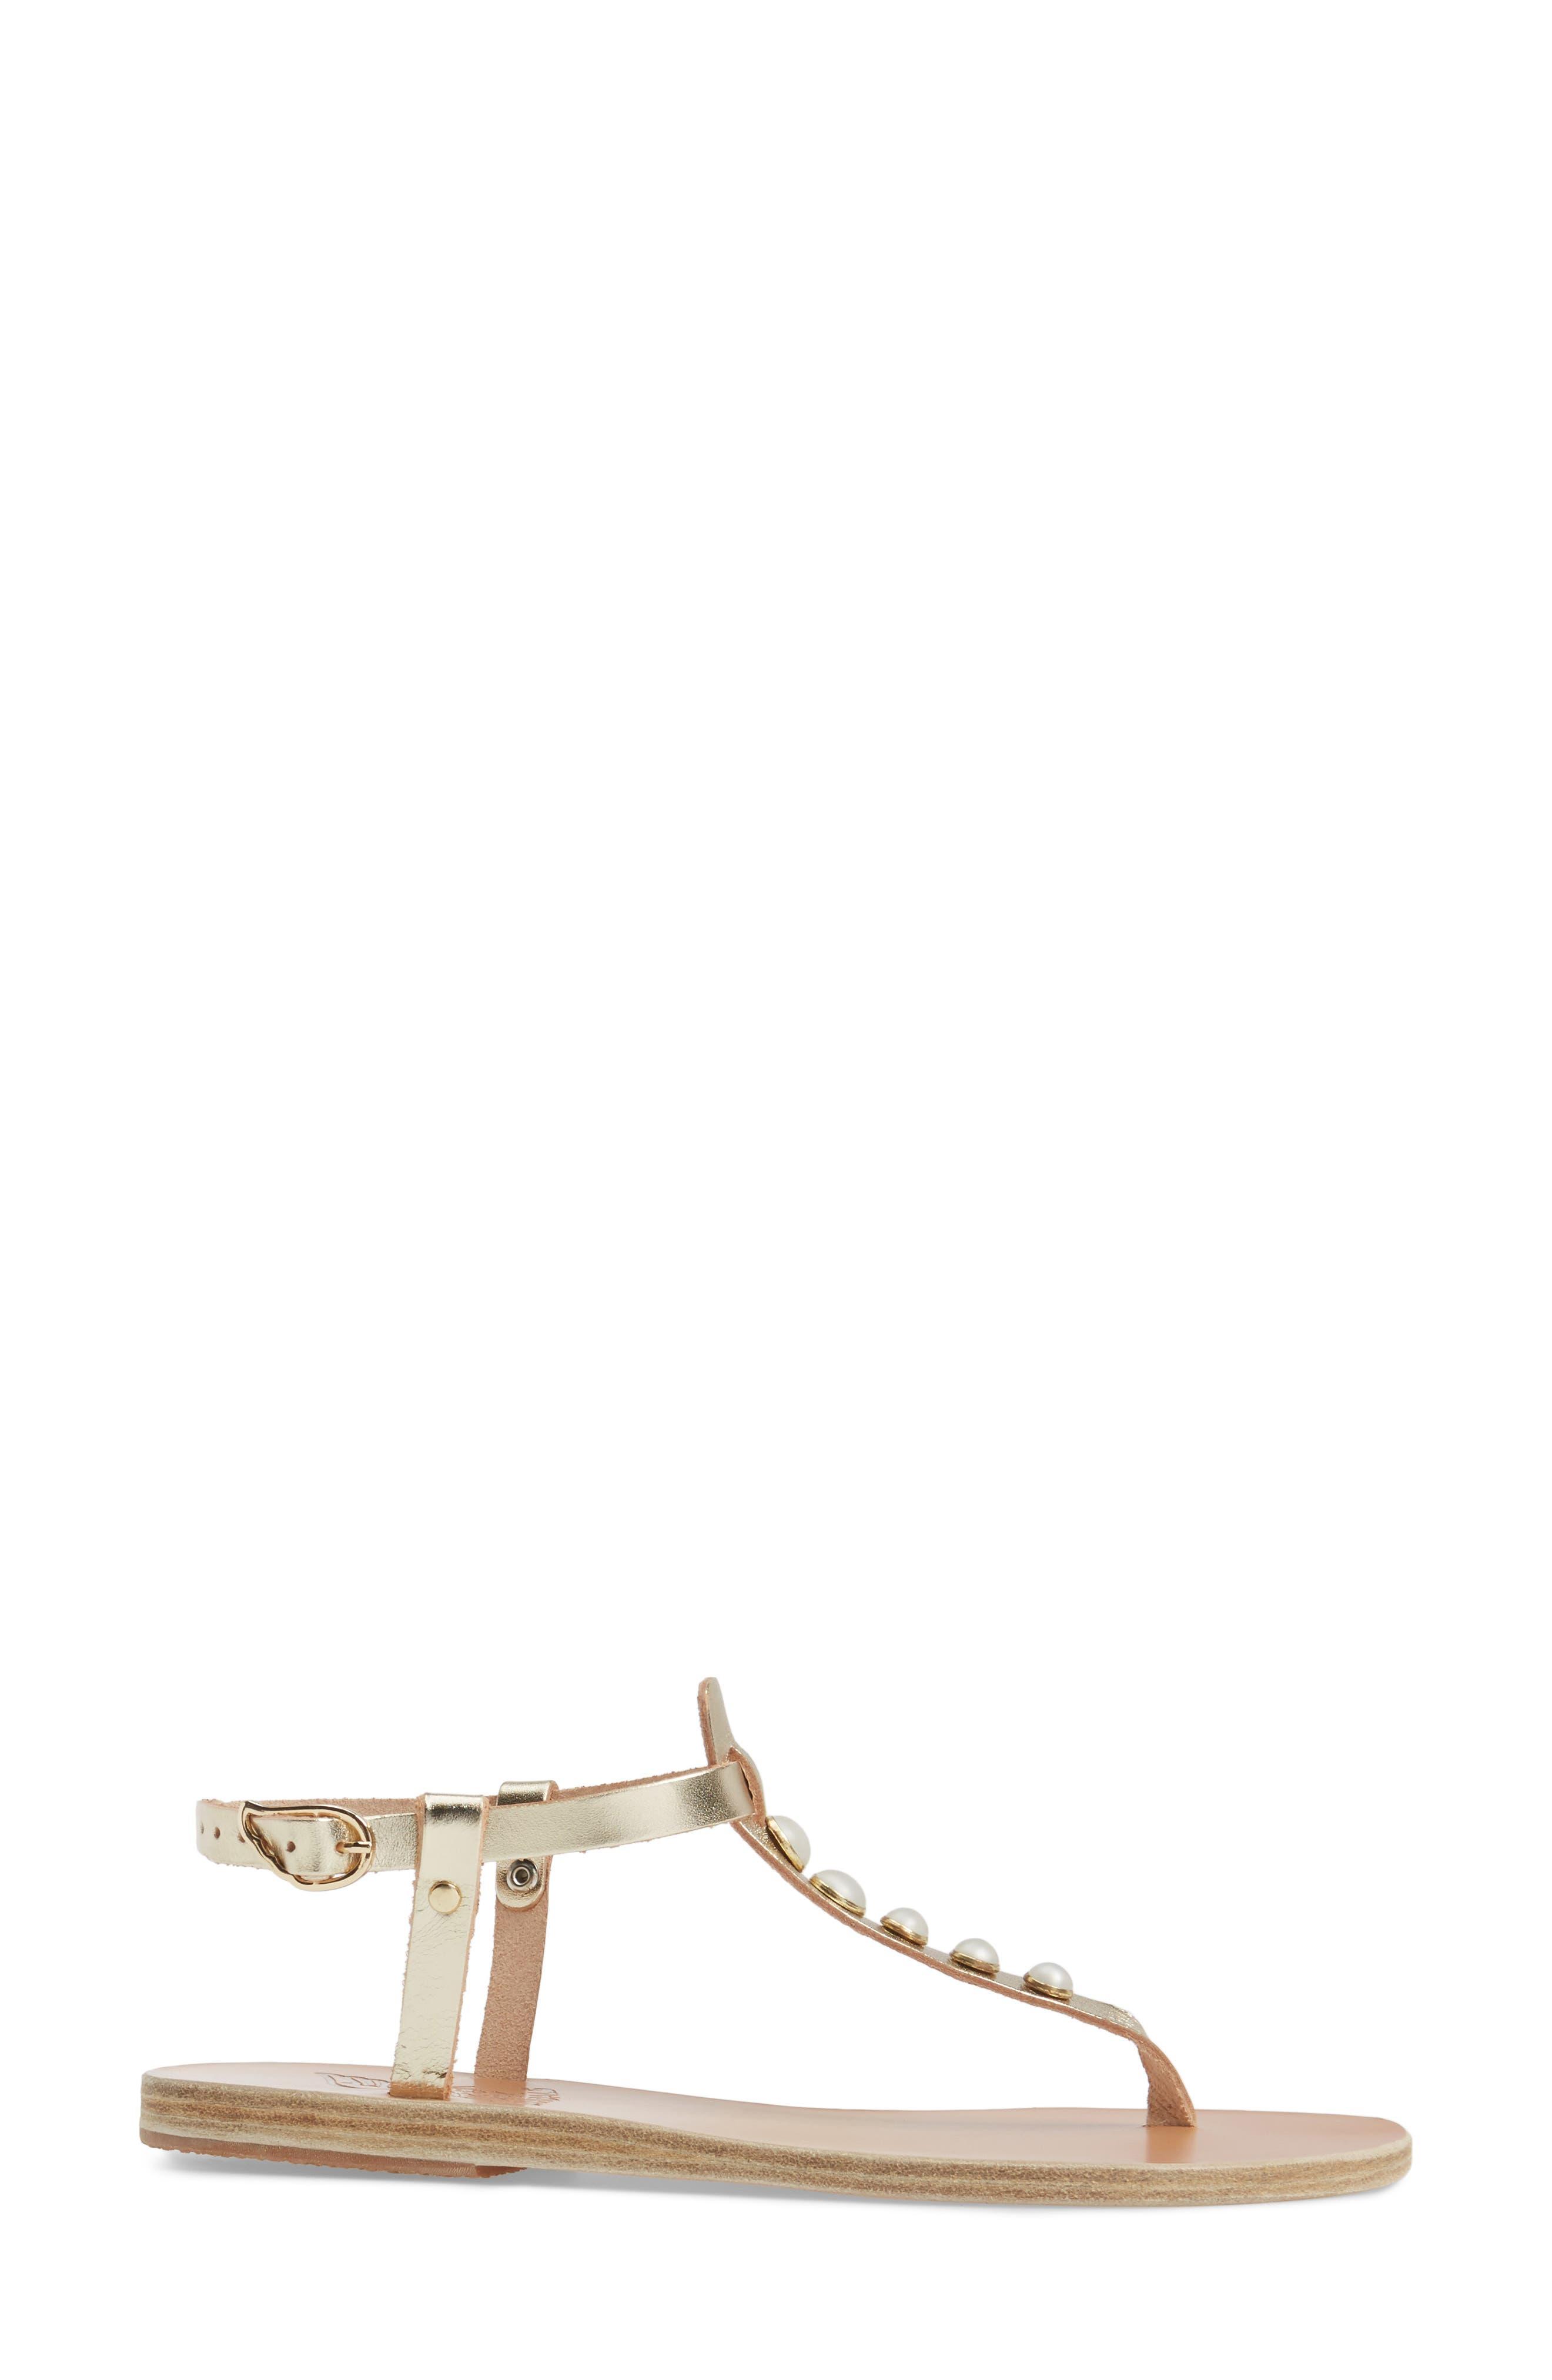 Lito Imitation Pearl Embellished T-Strap Sandal,                             Alternate thumbnail 3, color,                             040